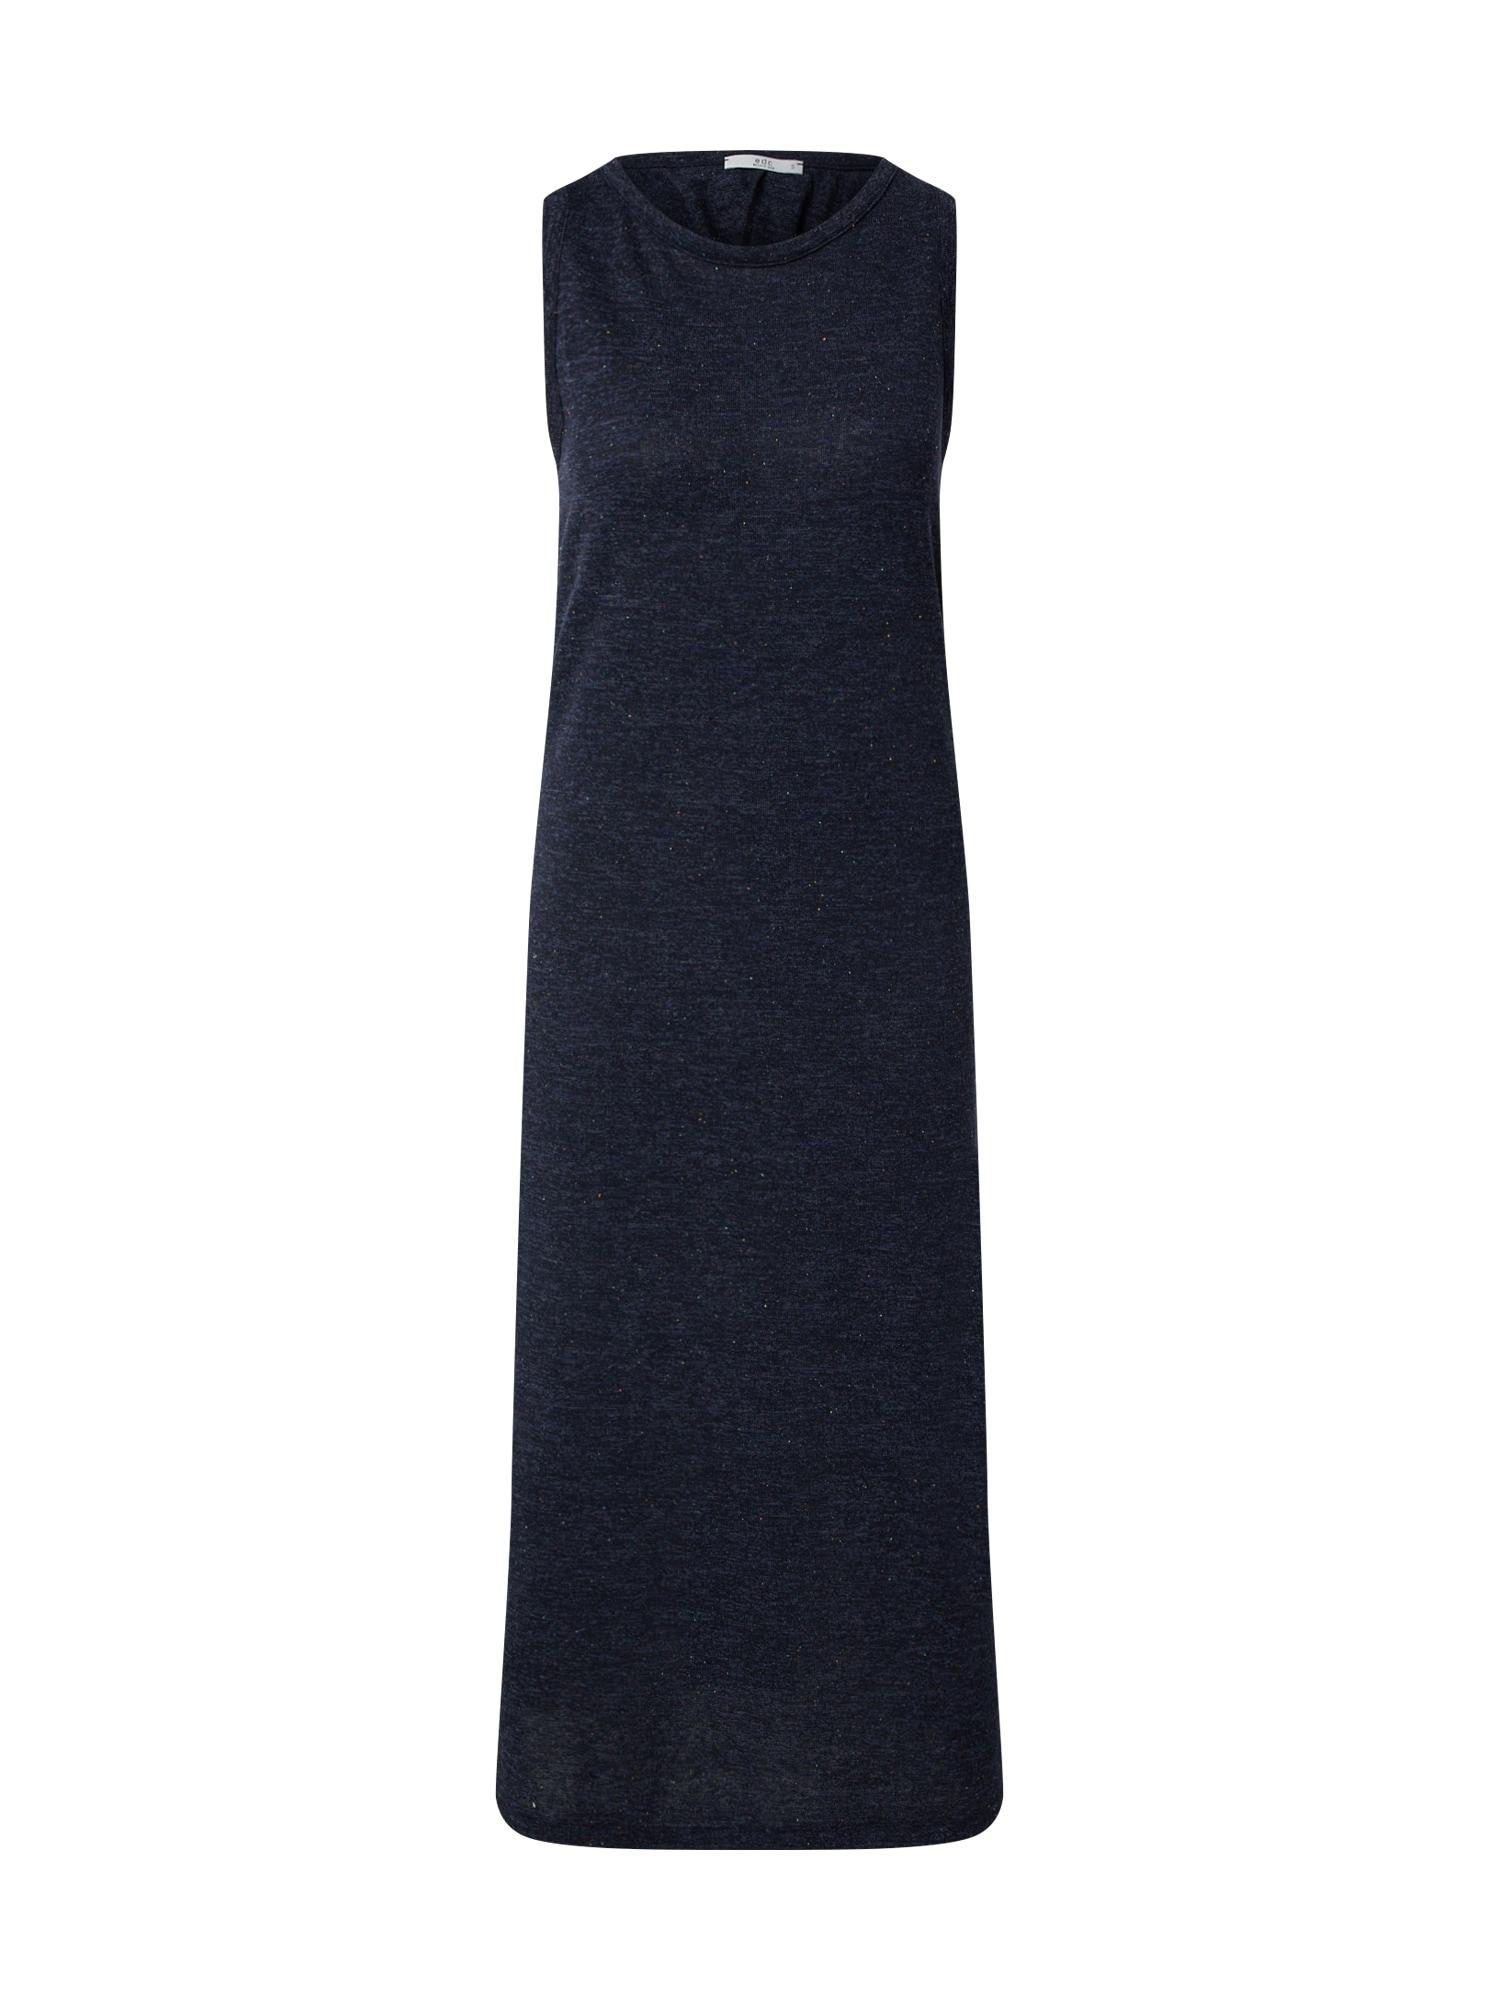 EDC BY ESPRIT Suknelė 'Neppy dress Dresses knitted long' tamsiai mėlyna